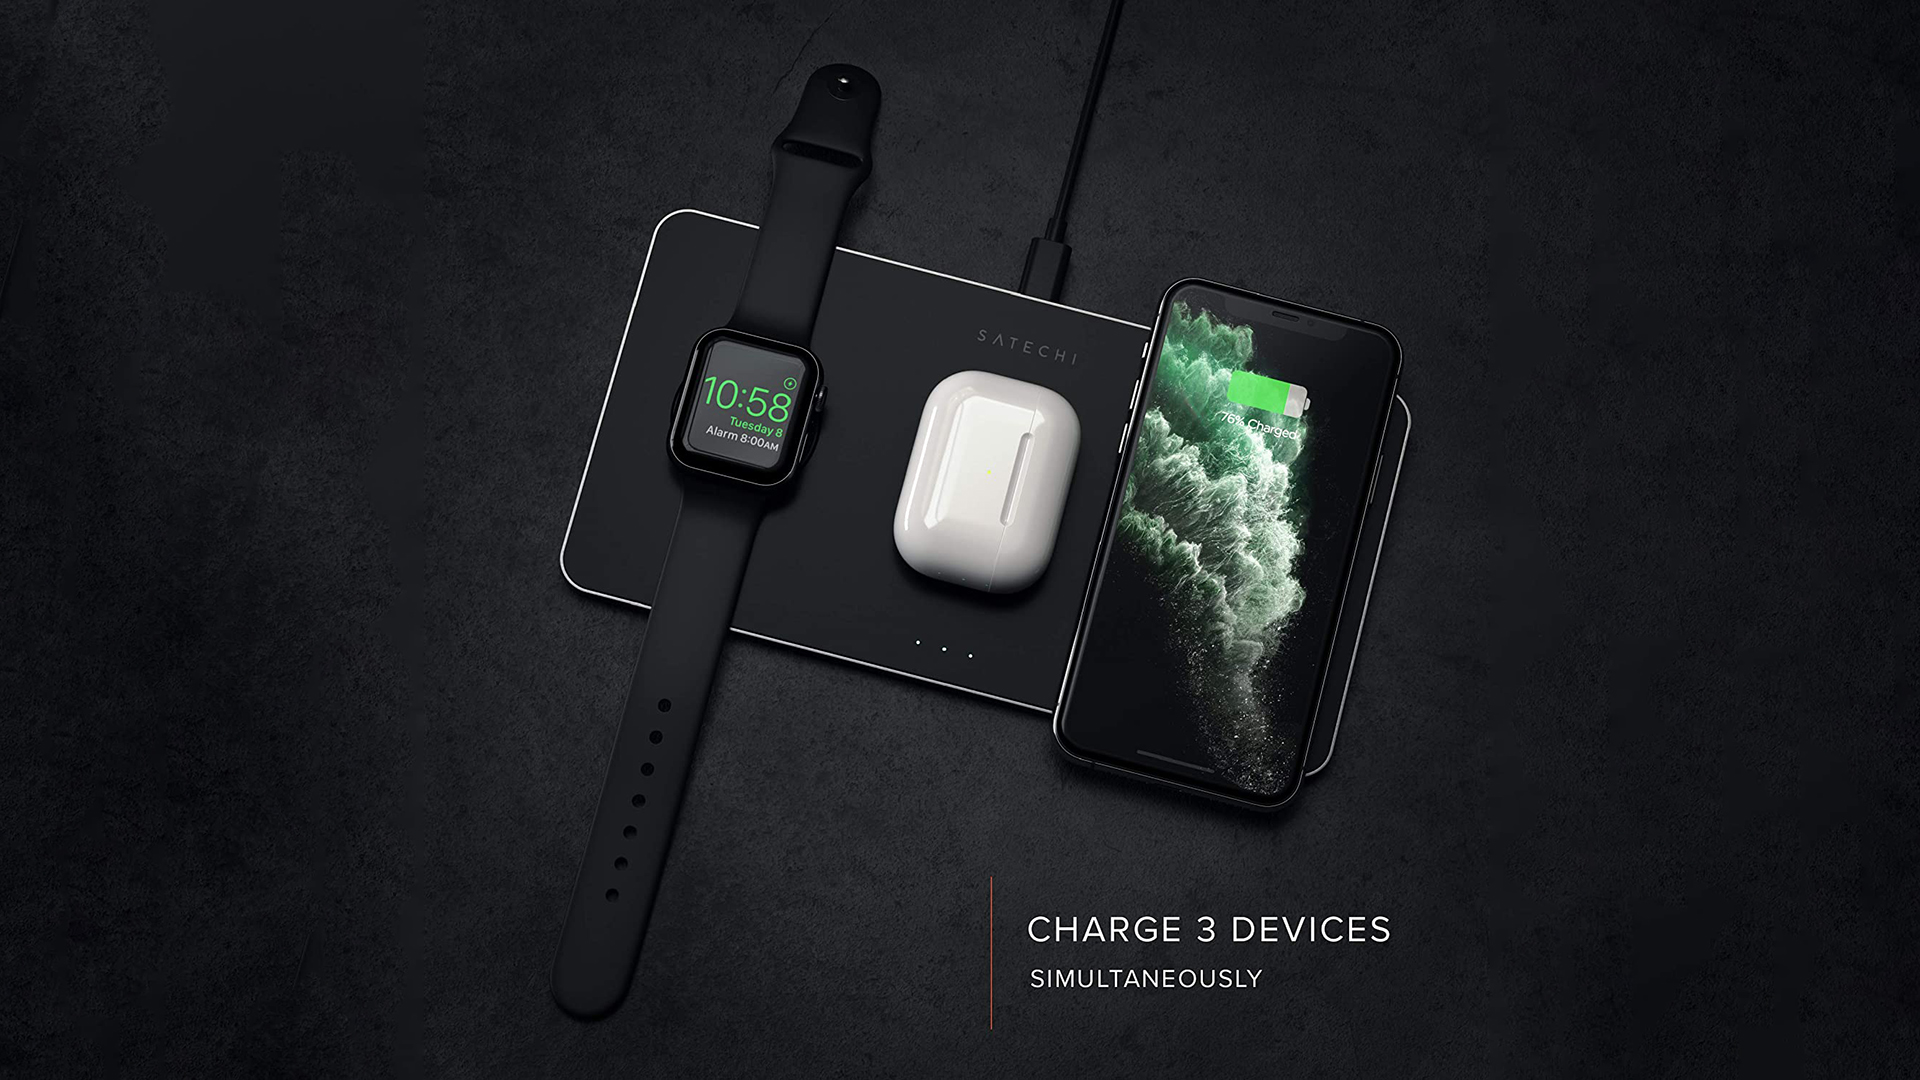 SatechiがiPhone、Apple Watch、AirPods Proを同時に充電できるワイヤレス充電器を国内で発売